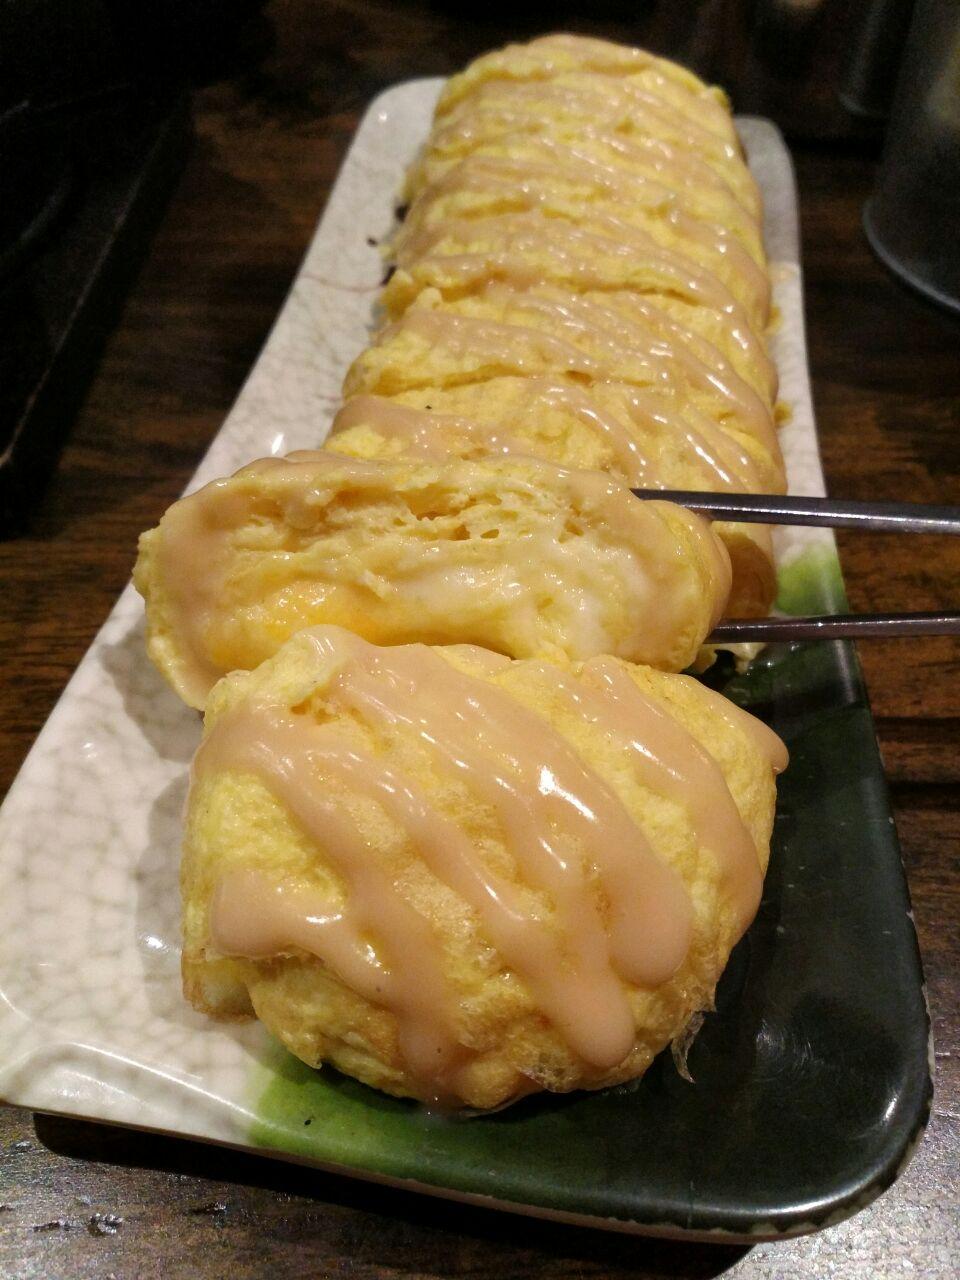 Mustard Cheese Egg Roll ($9.80++)